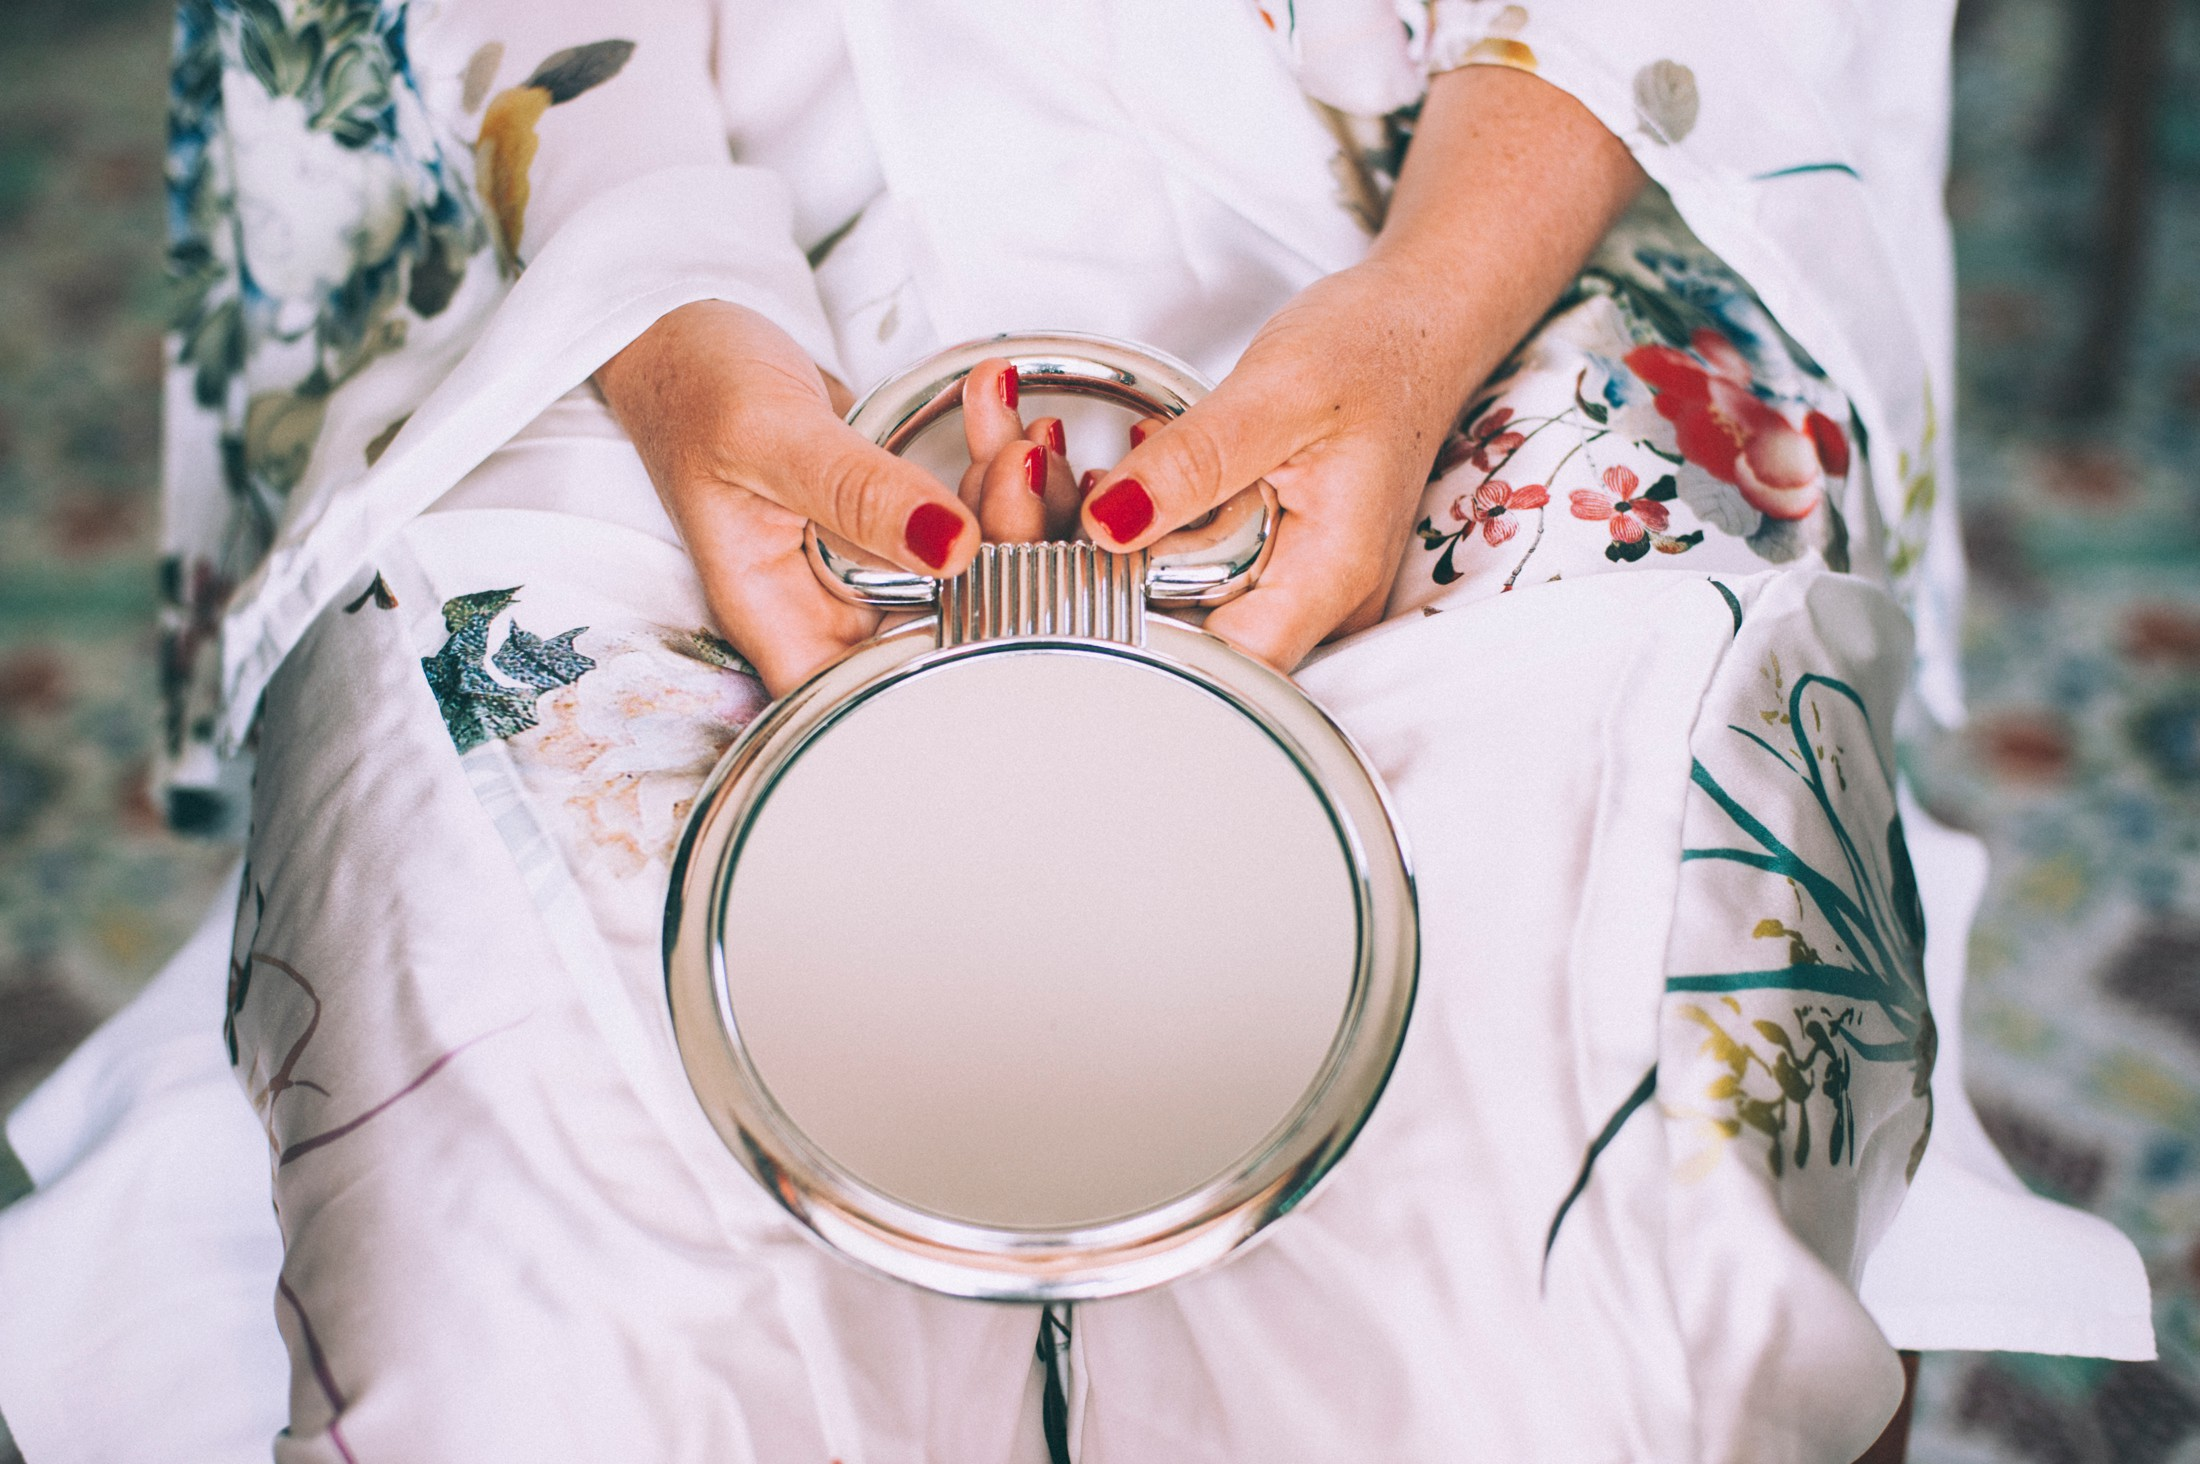 rustic wedding in ravello small mirror in the bride's hands